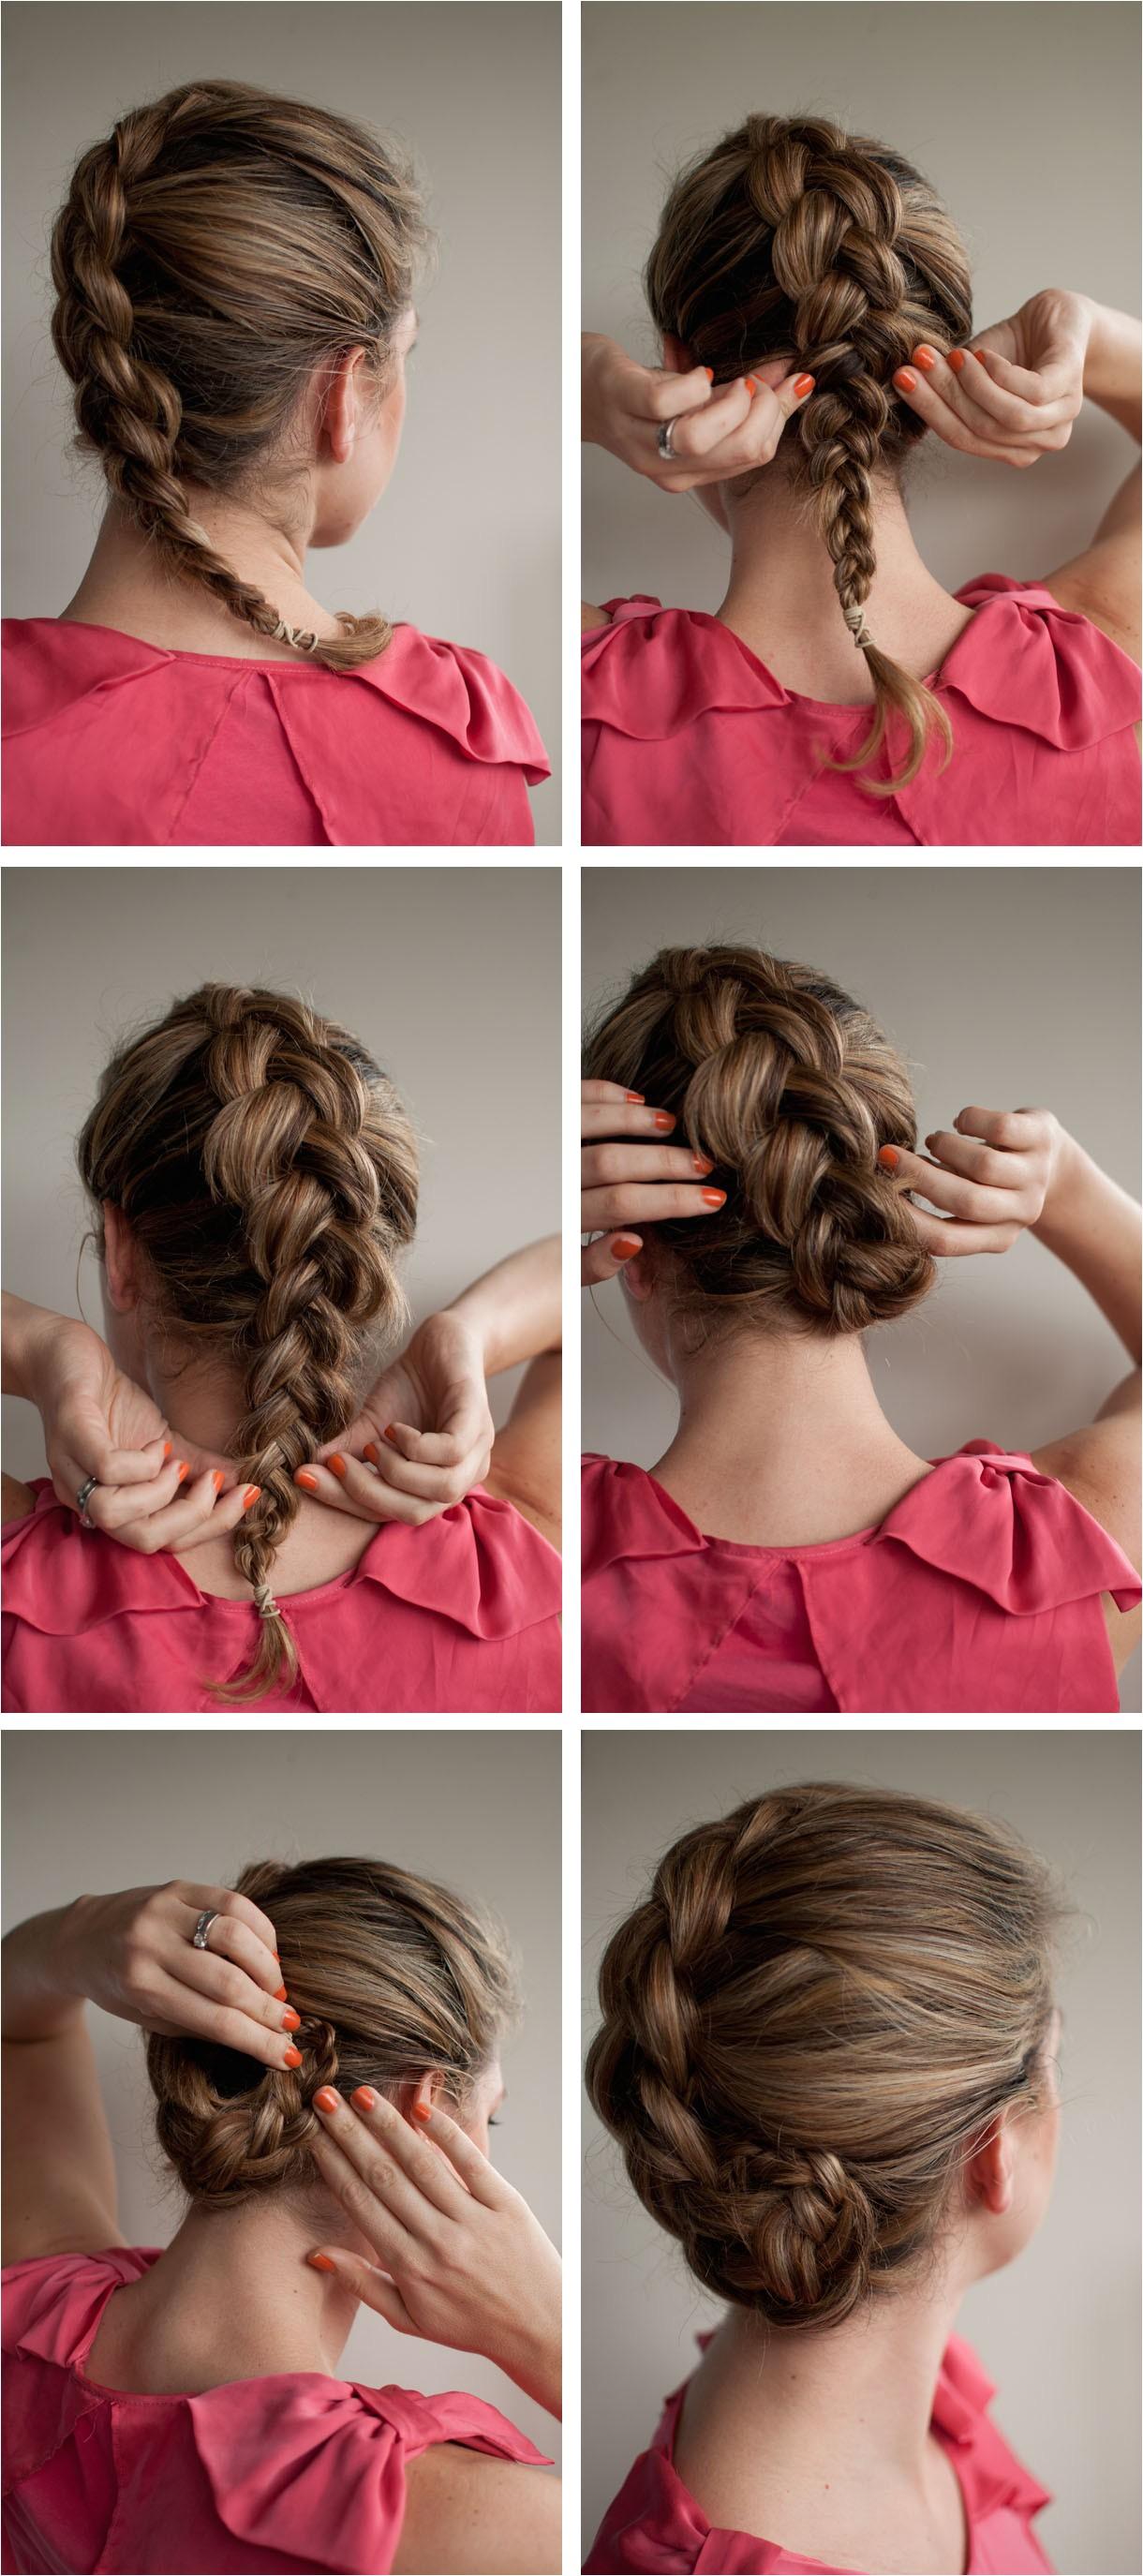 braided upstyle hair romance on latest hairstyles